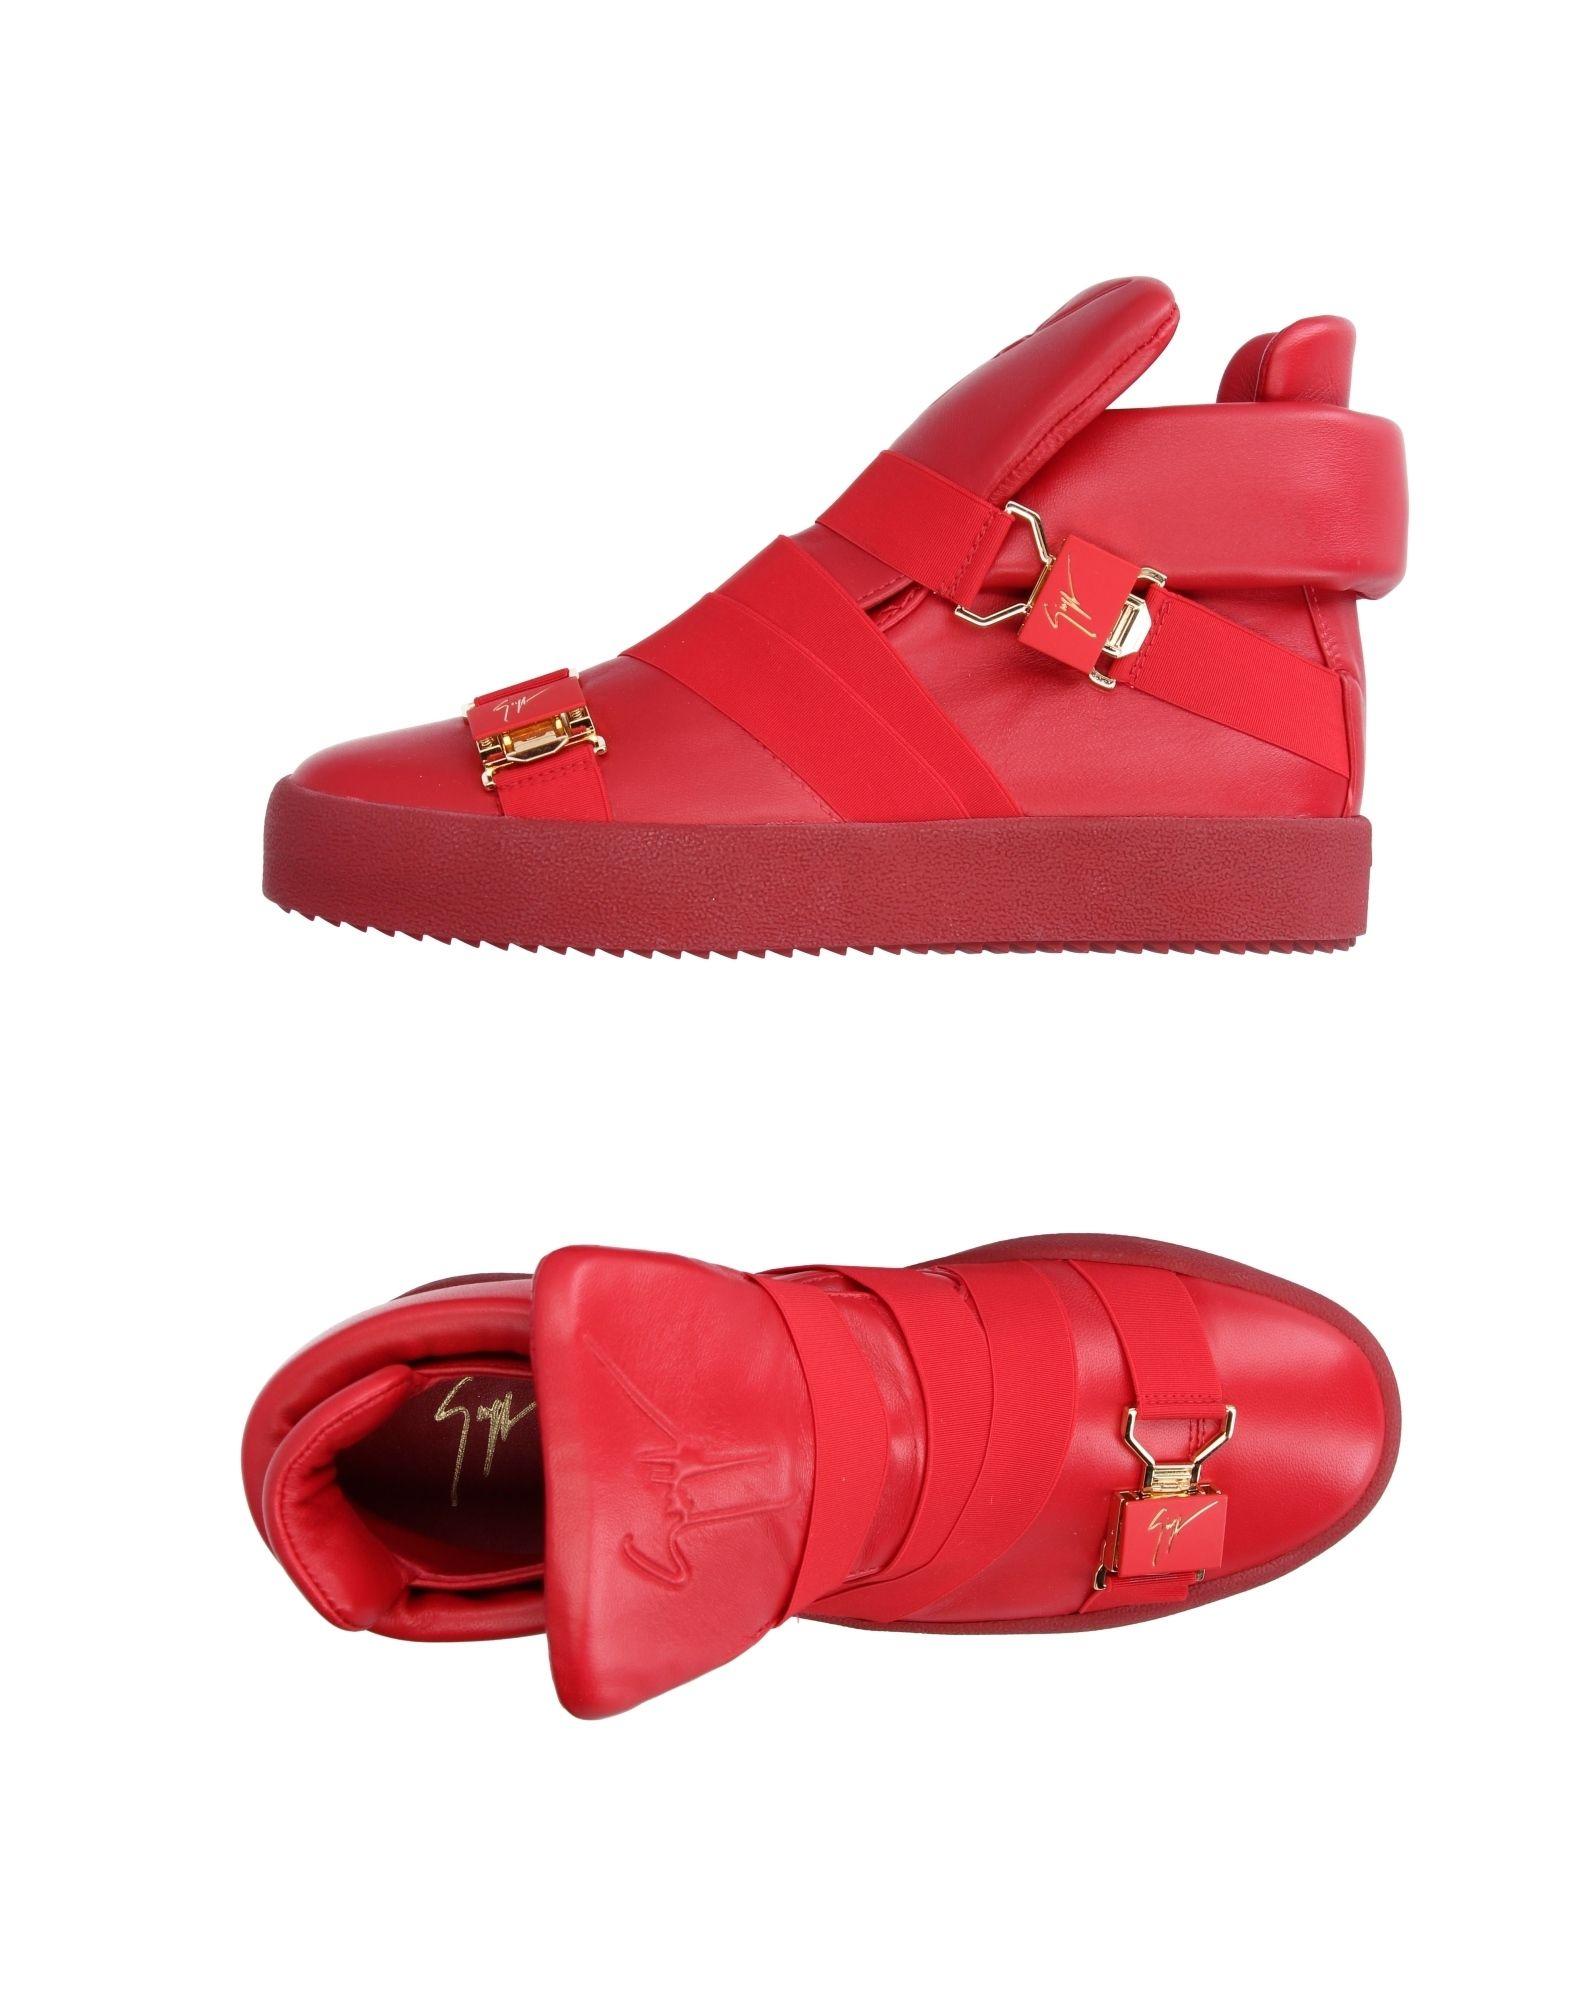 Giuseppe Zanotti Sneakers Herren  11209942DR Gute Qualität beliebte Schuhe